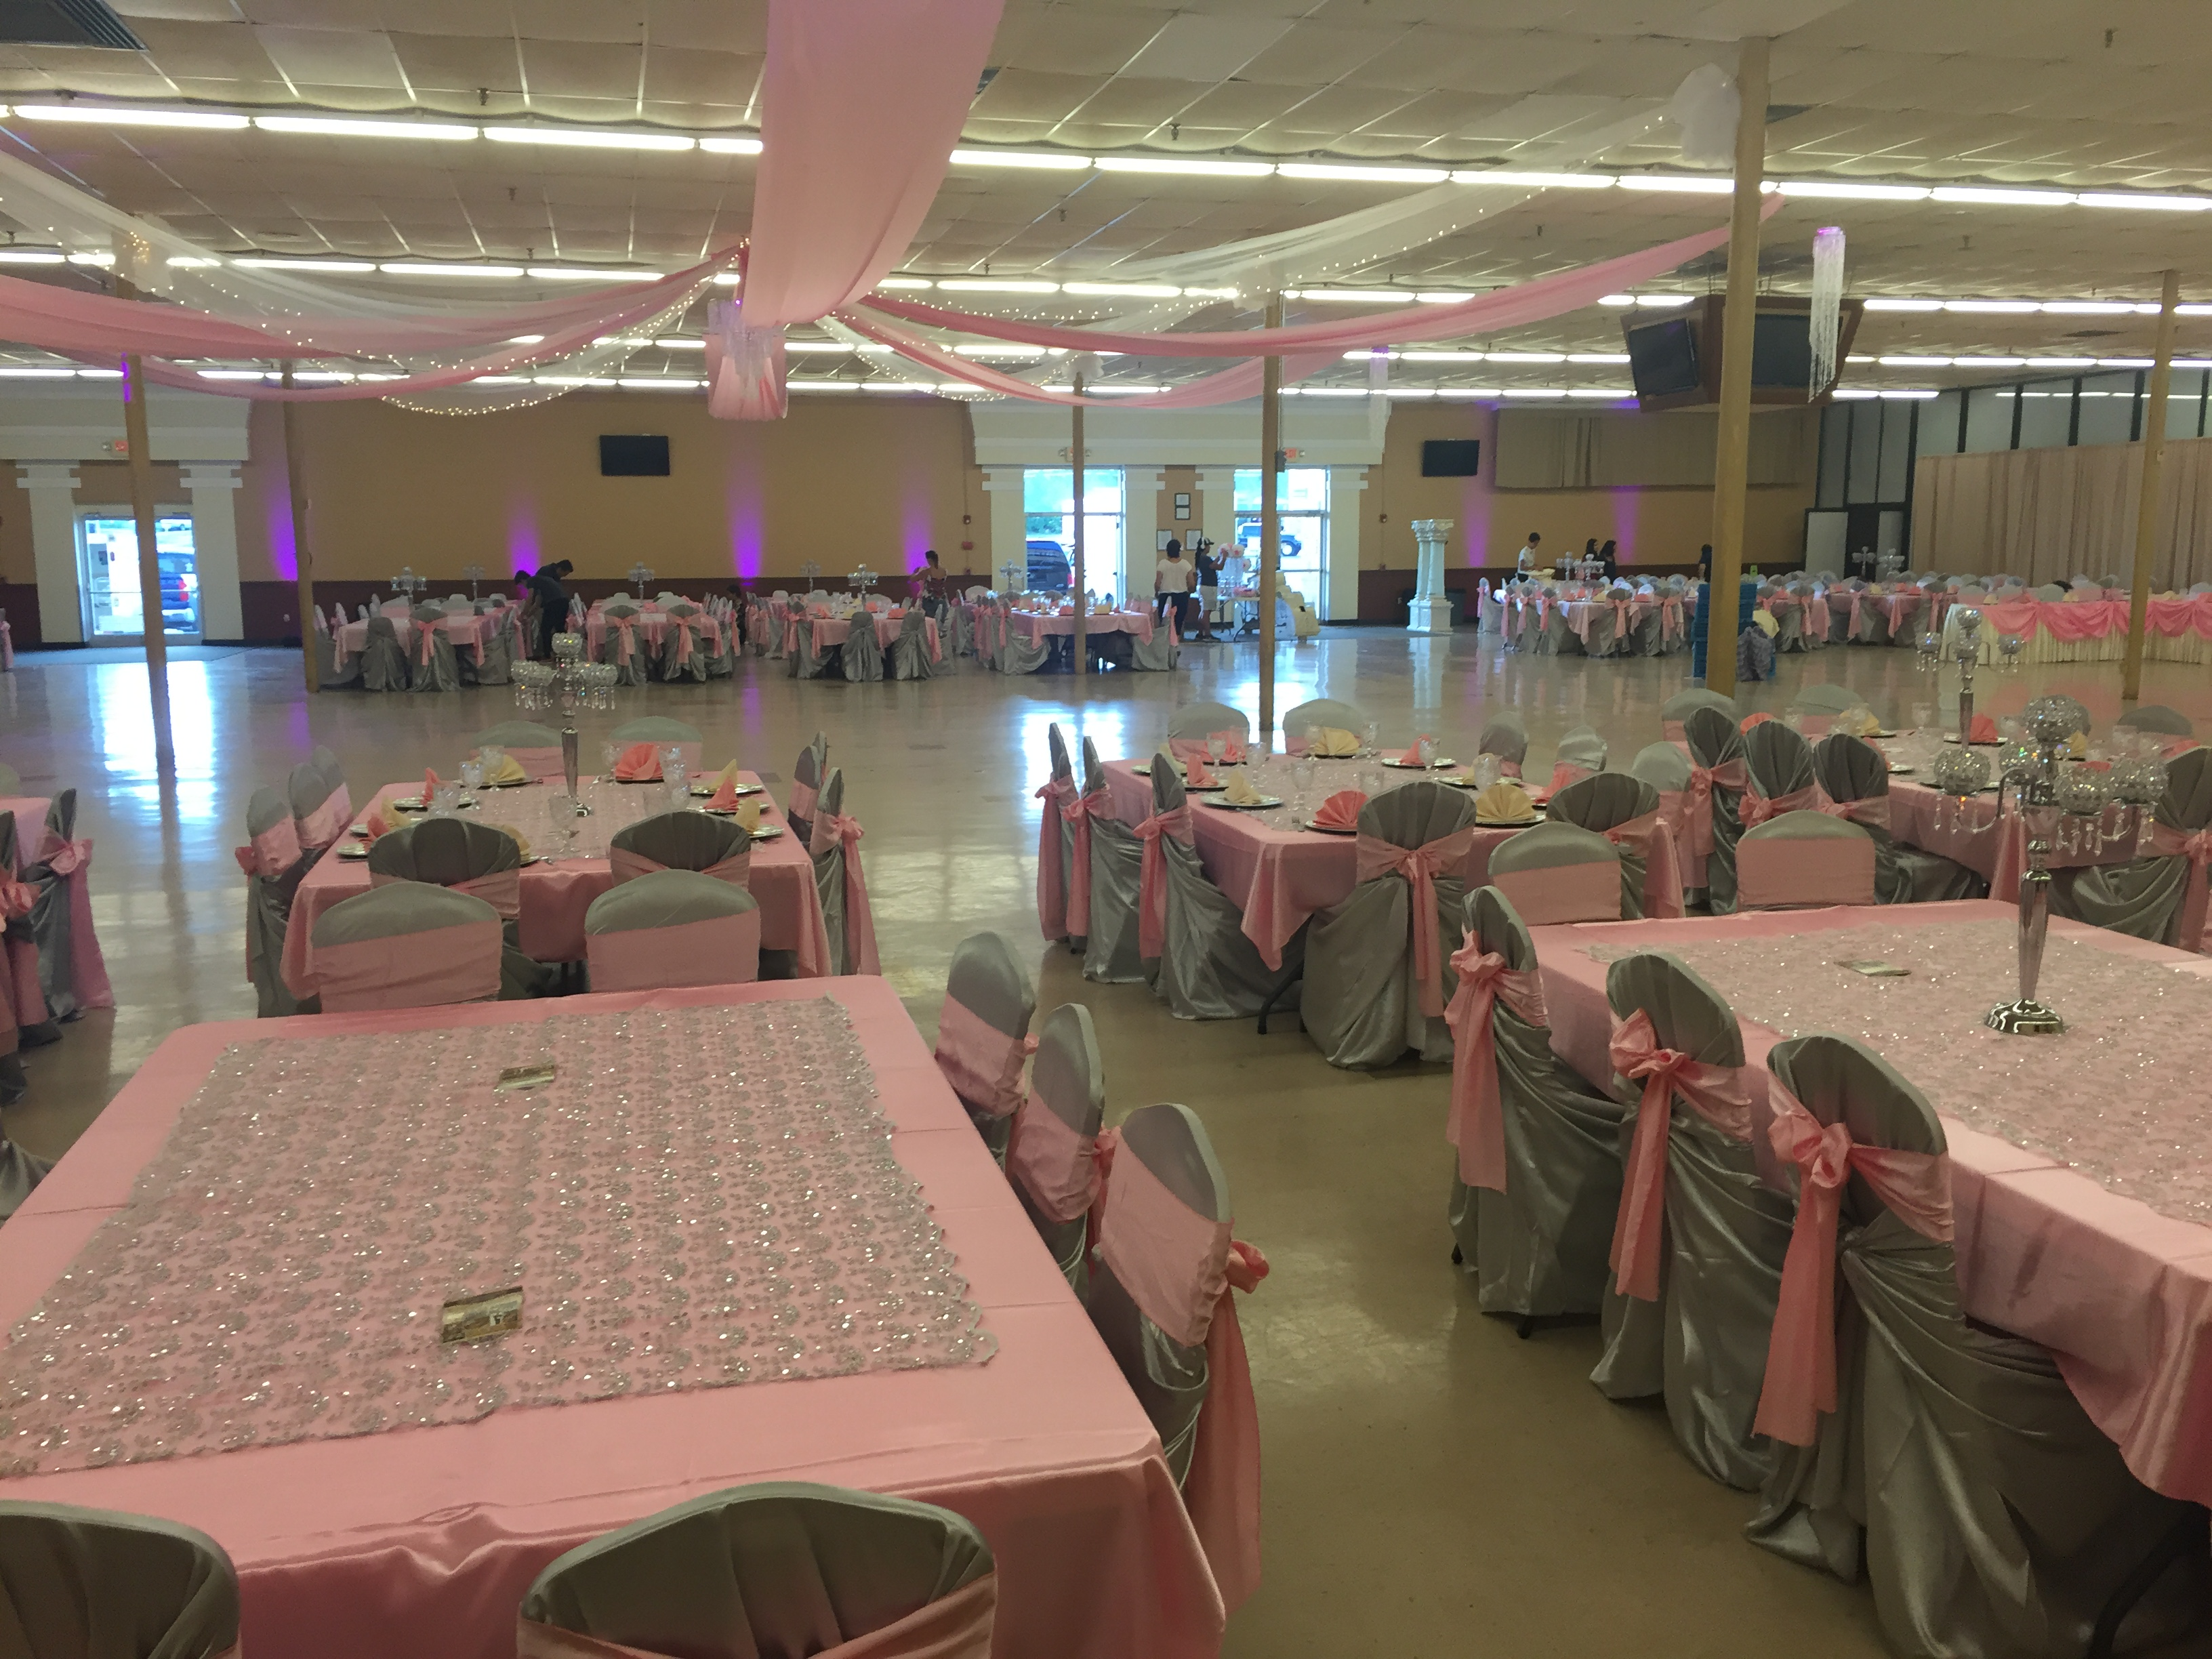 Callaghan Plaza Ballroom San Antonio Tx 78228 Yp Com